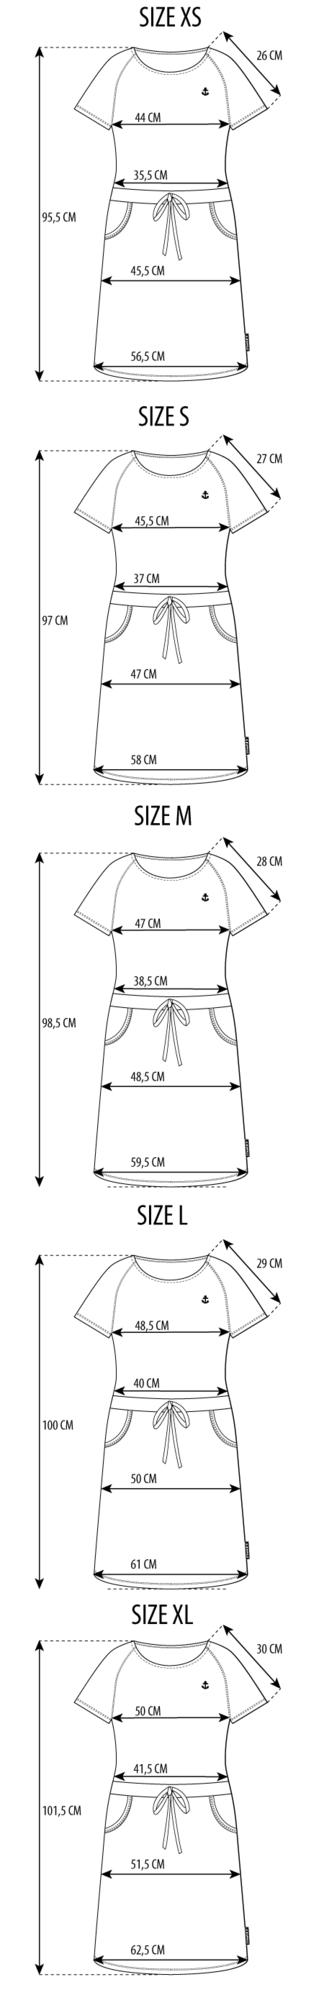 Maattabel La Robe Bateau Striped